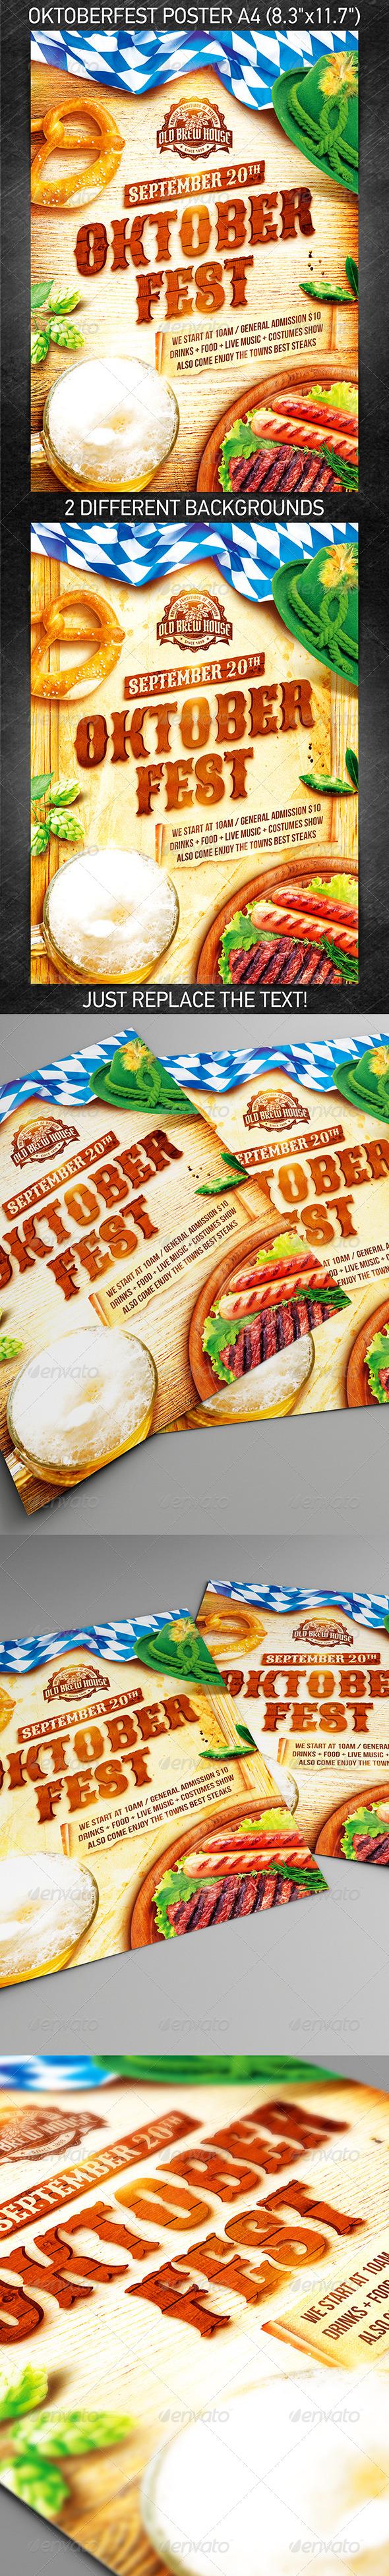 GraphicRiver Oktoberfest Festival Poster vol.3 8731608